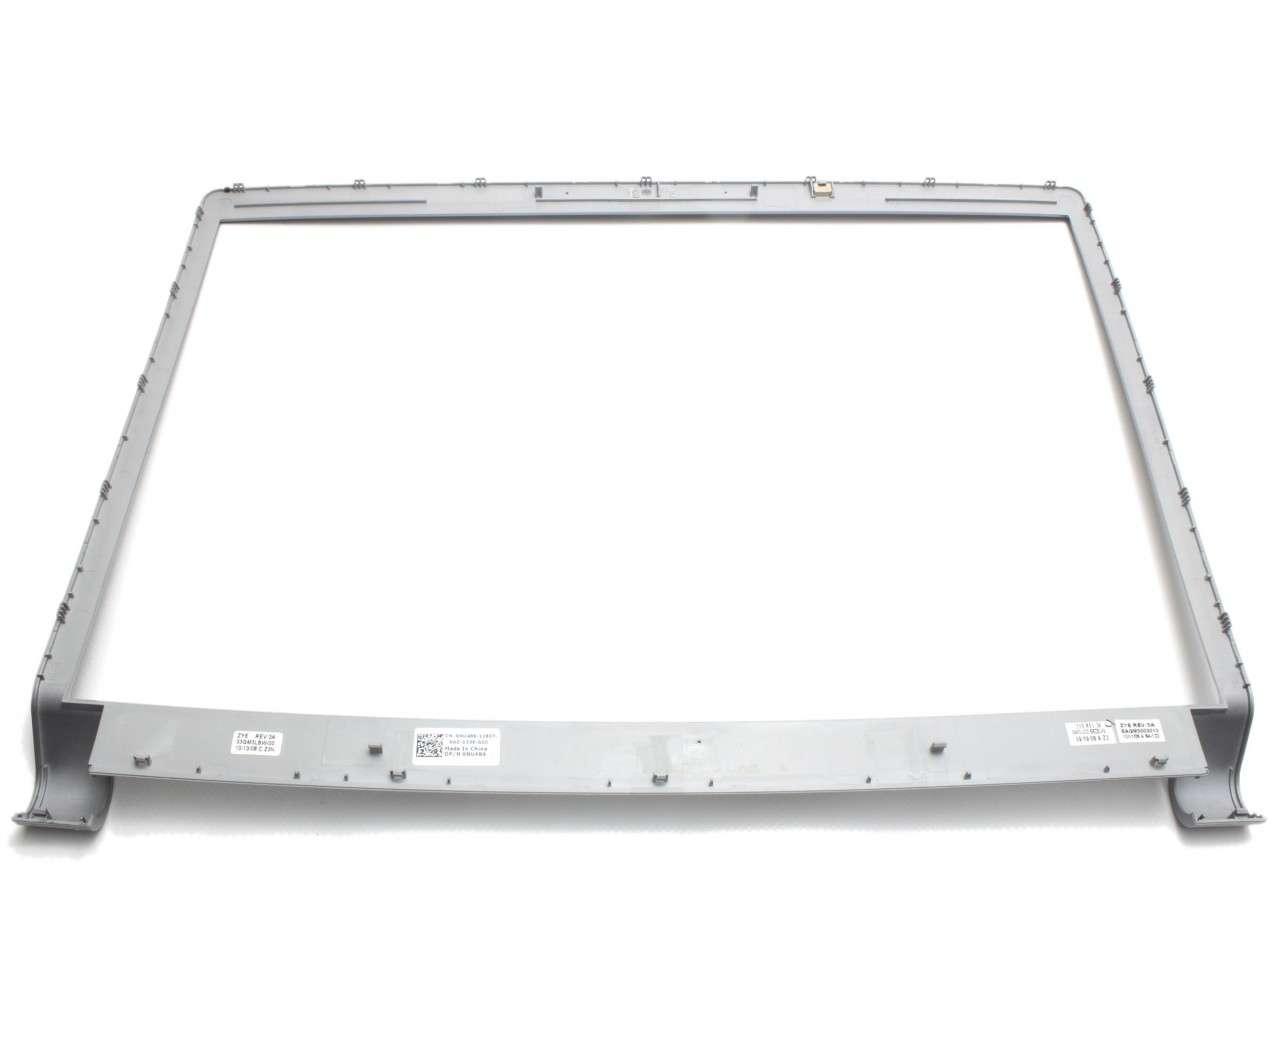 Rama Display Dell 33GM3LBWI00 Bezel Front Cover Argintie imagine powerlaptop.ro 2021